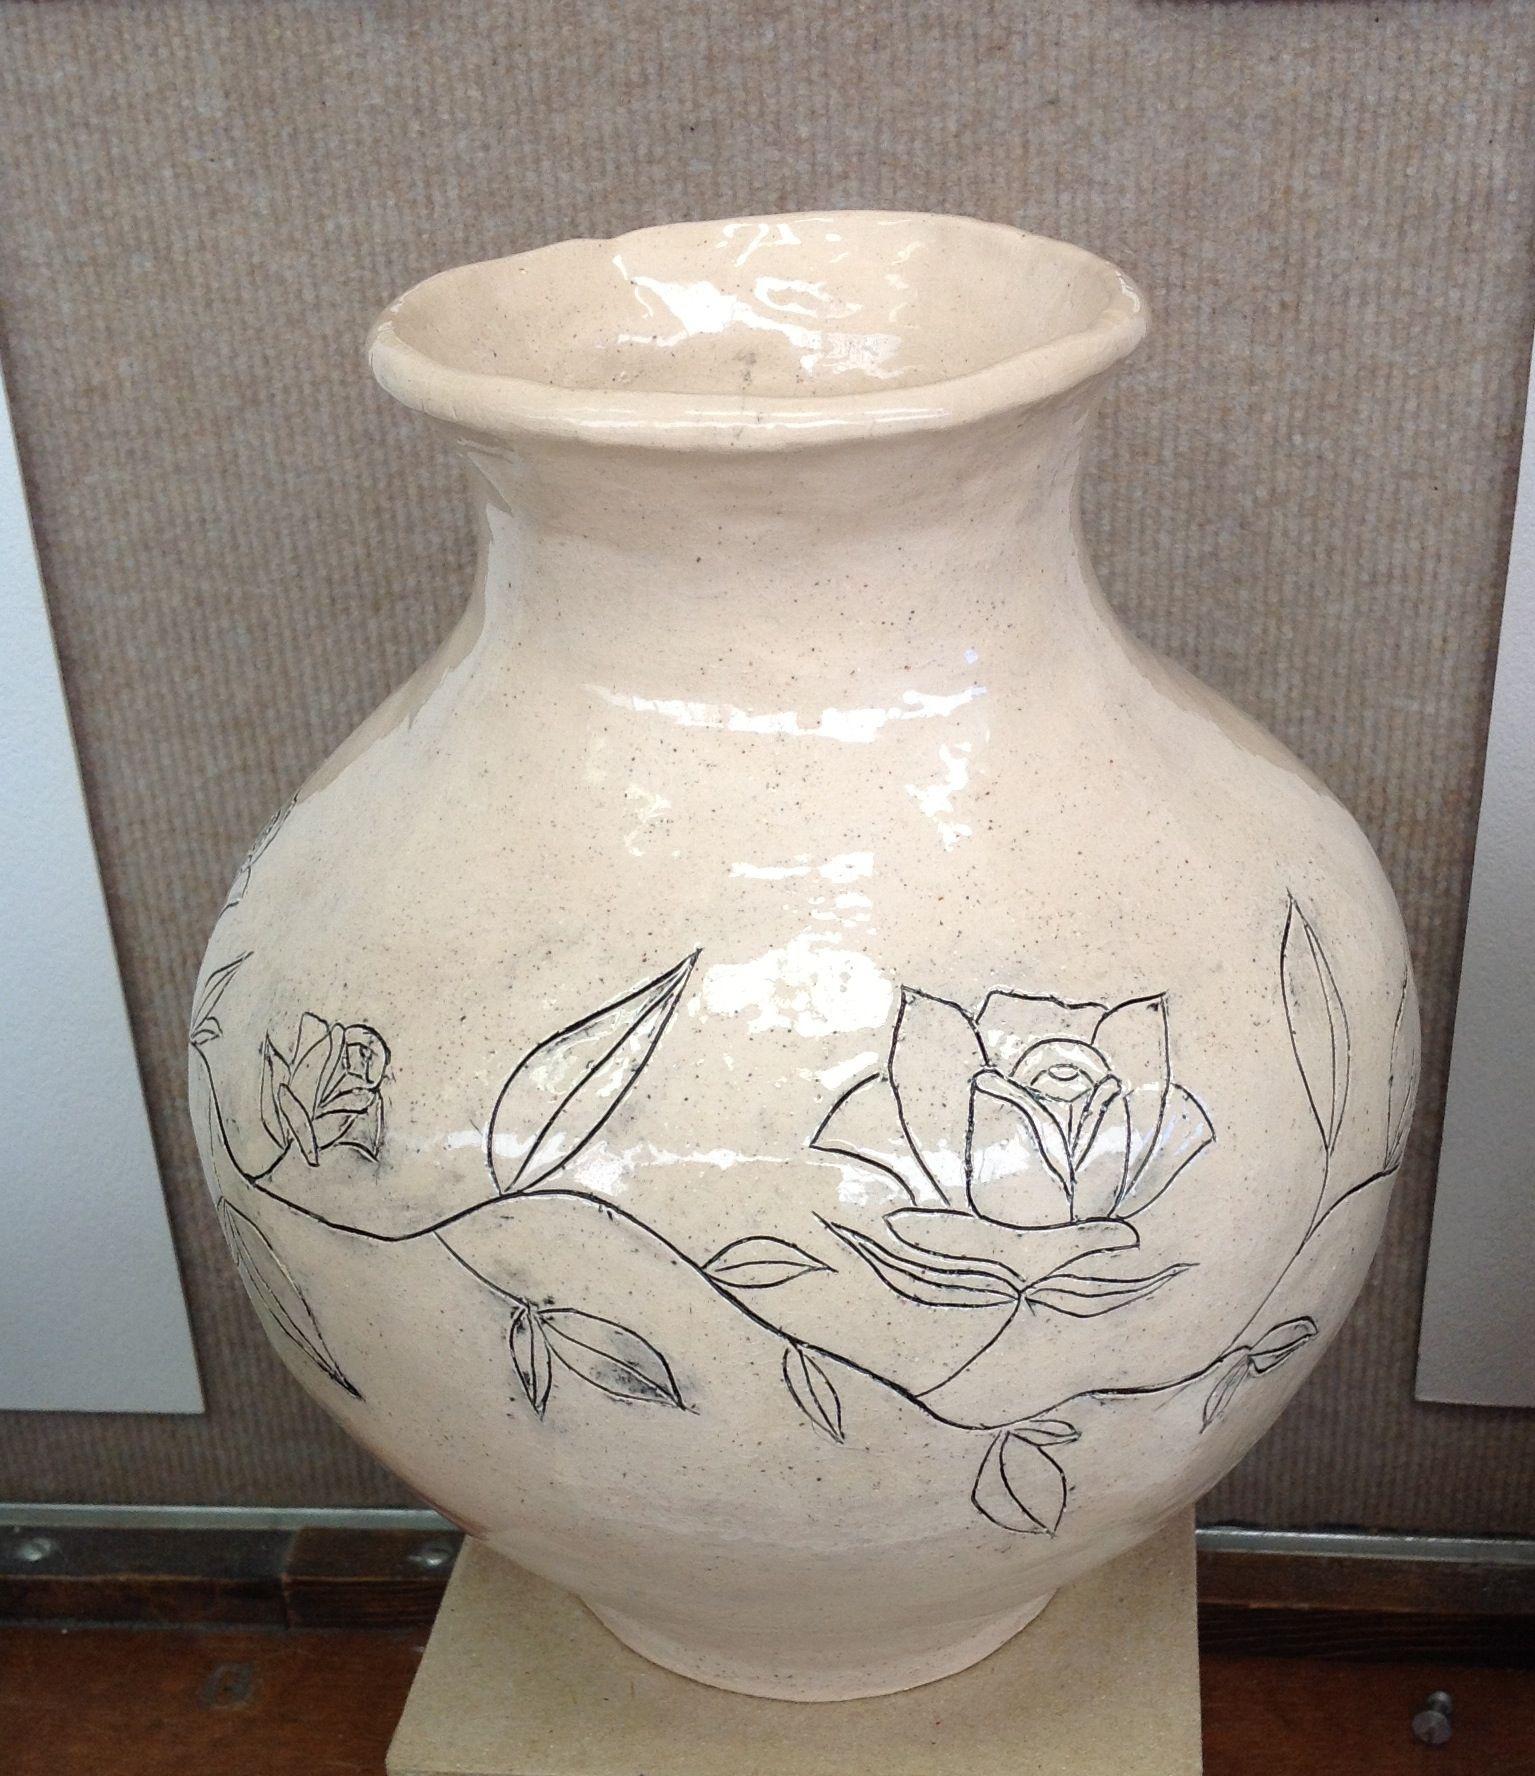 Coil built large vase with mishima surface design high school coil built large vase with mishima surface design reviewsmspy